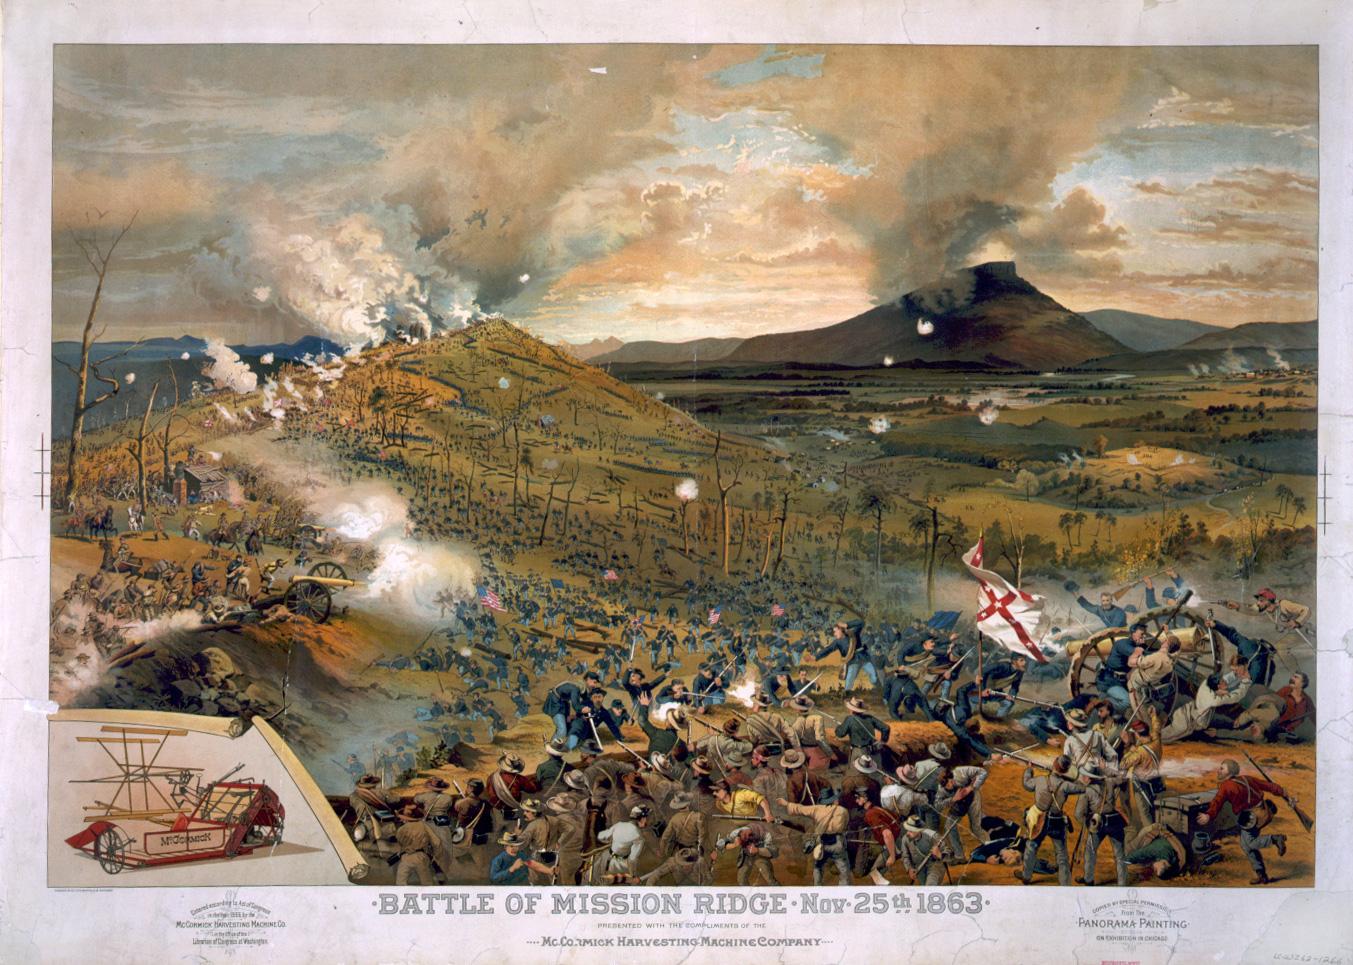 The Battle of Missionary Ridge